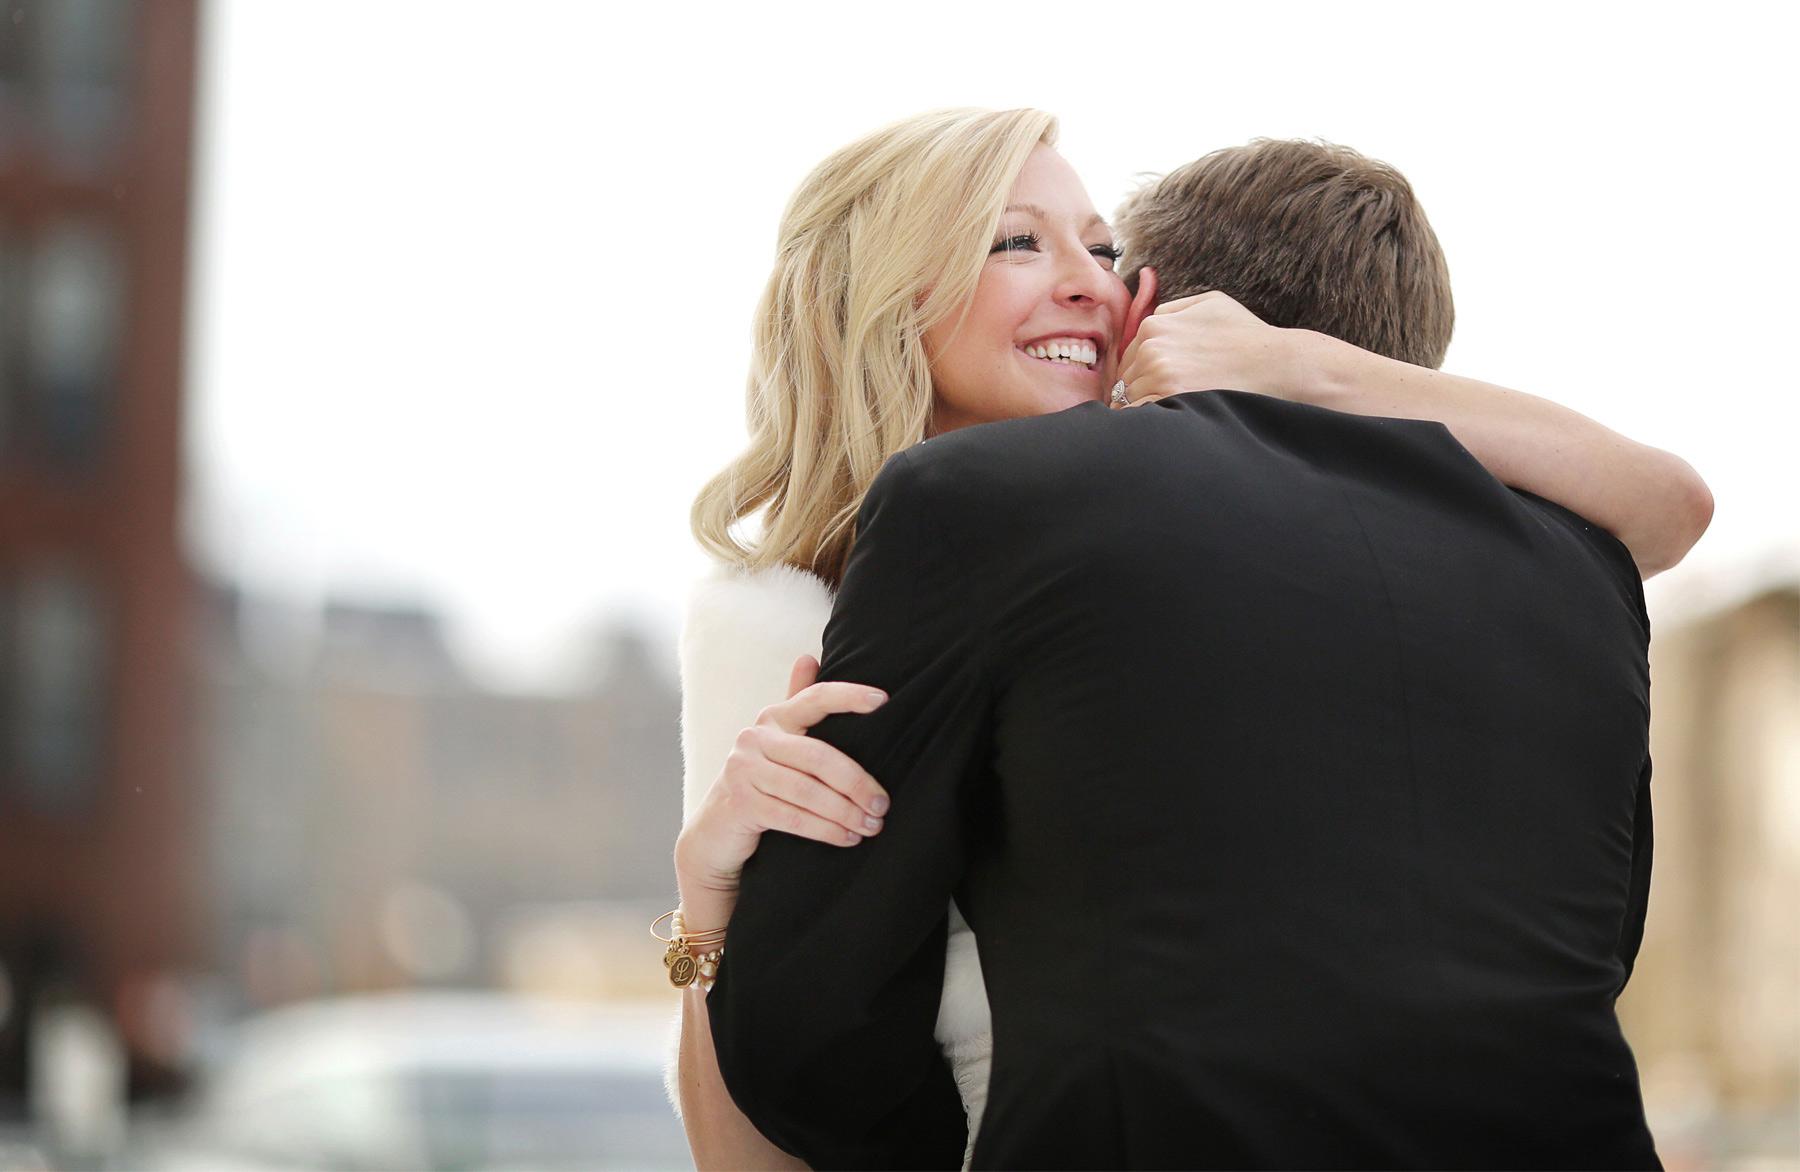 04-Minneapolis-Minnesota-Wedding-Photography-by-Vick-Photography-Downtown-First-Look-Skyline-Caroline-and-J.jpg